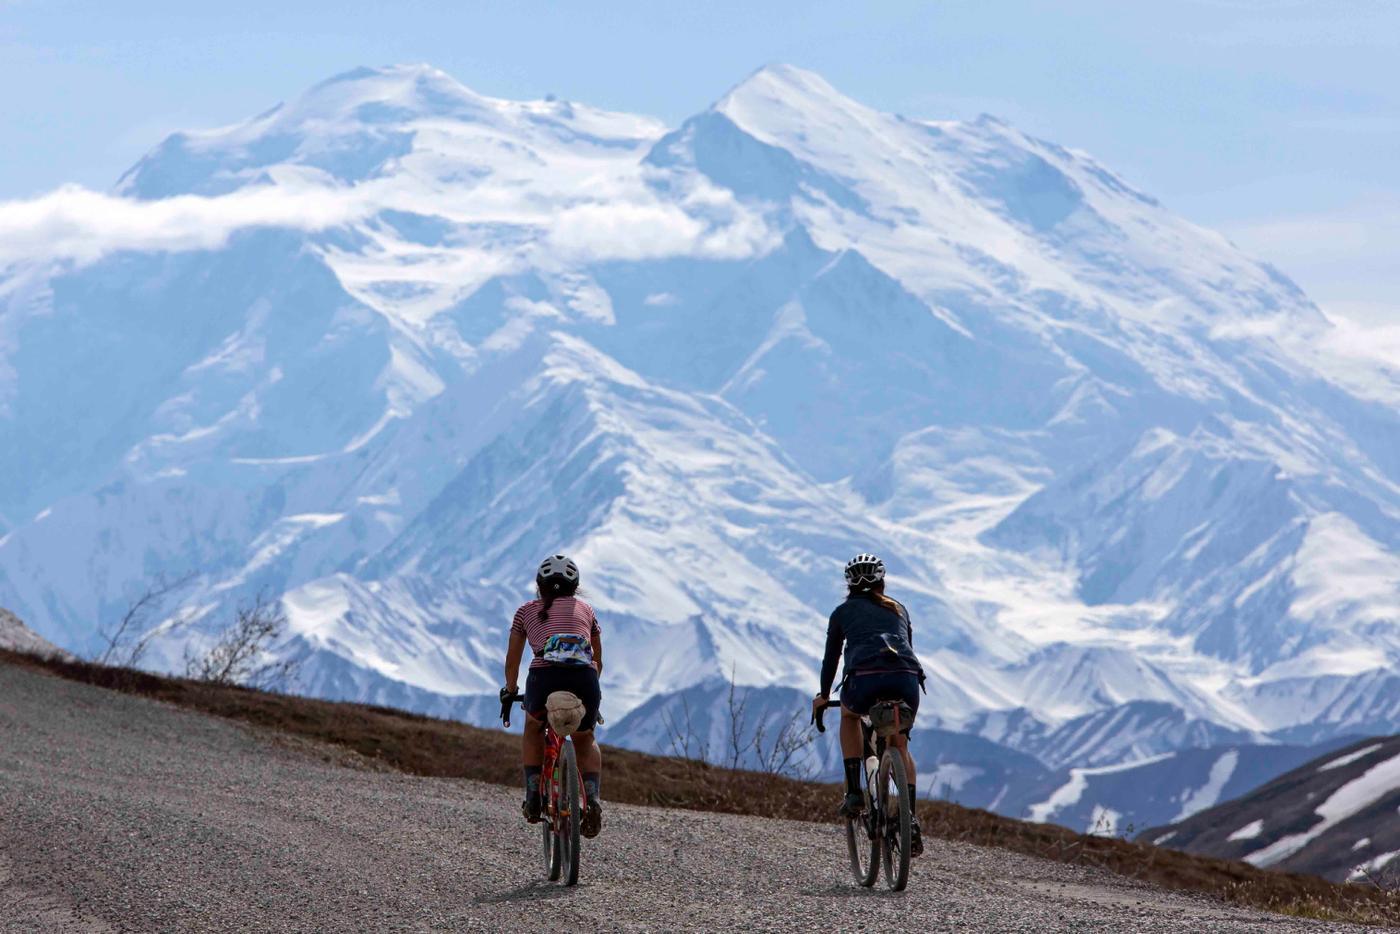 Lael Rides Alaska 2021 Femme-Trans-Women's Scholarship